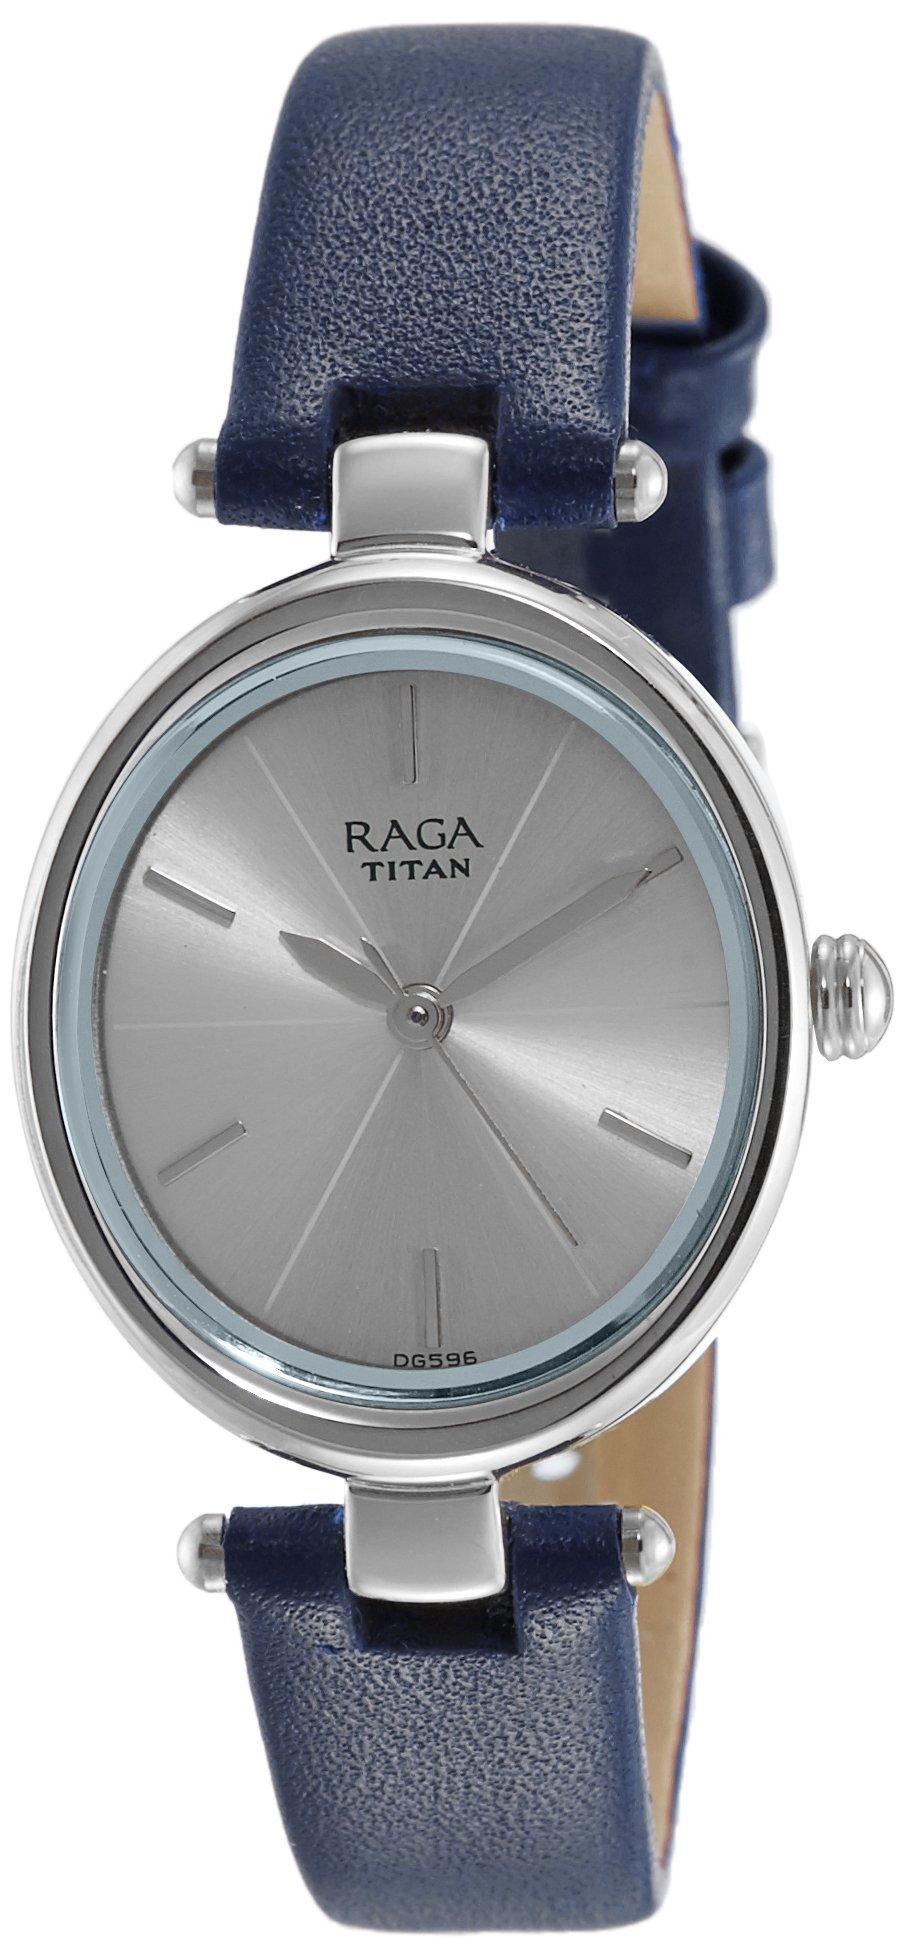 Titan Raga Viva Analog Blue Dial Women's Gold/Silver Metal/Brass/Leather, Jewellery Design, Bracelet Style, Designer, Quartz Glass, Water Resistant Wrist Watch